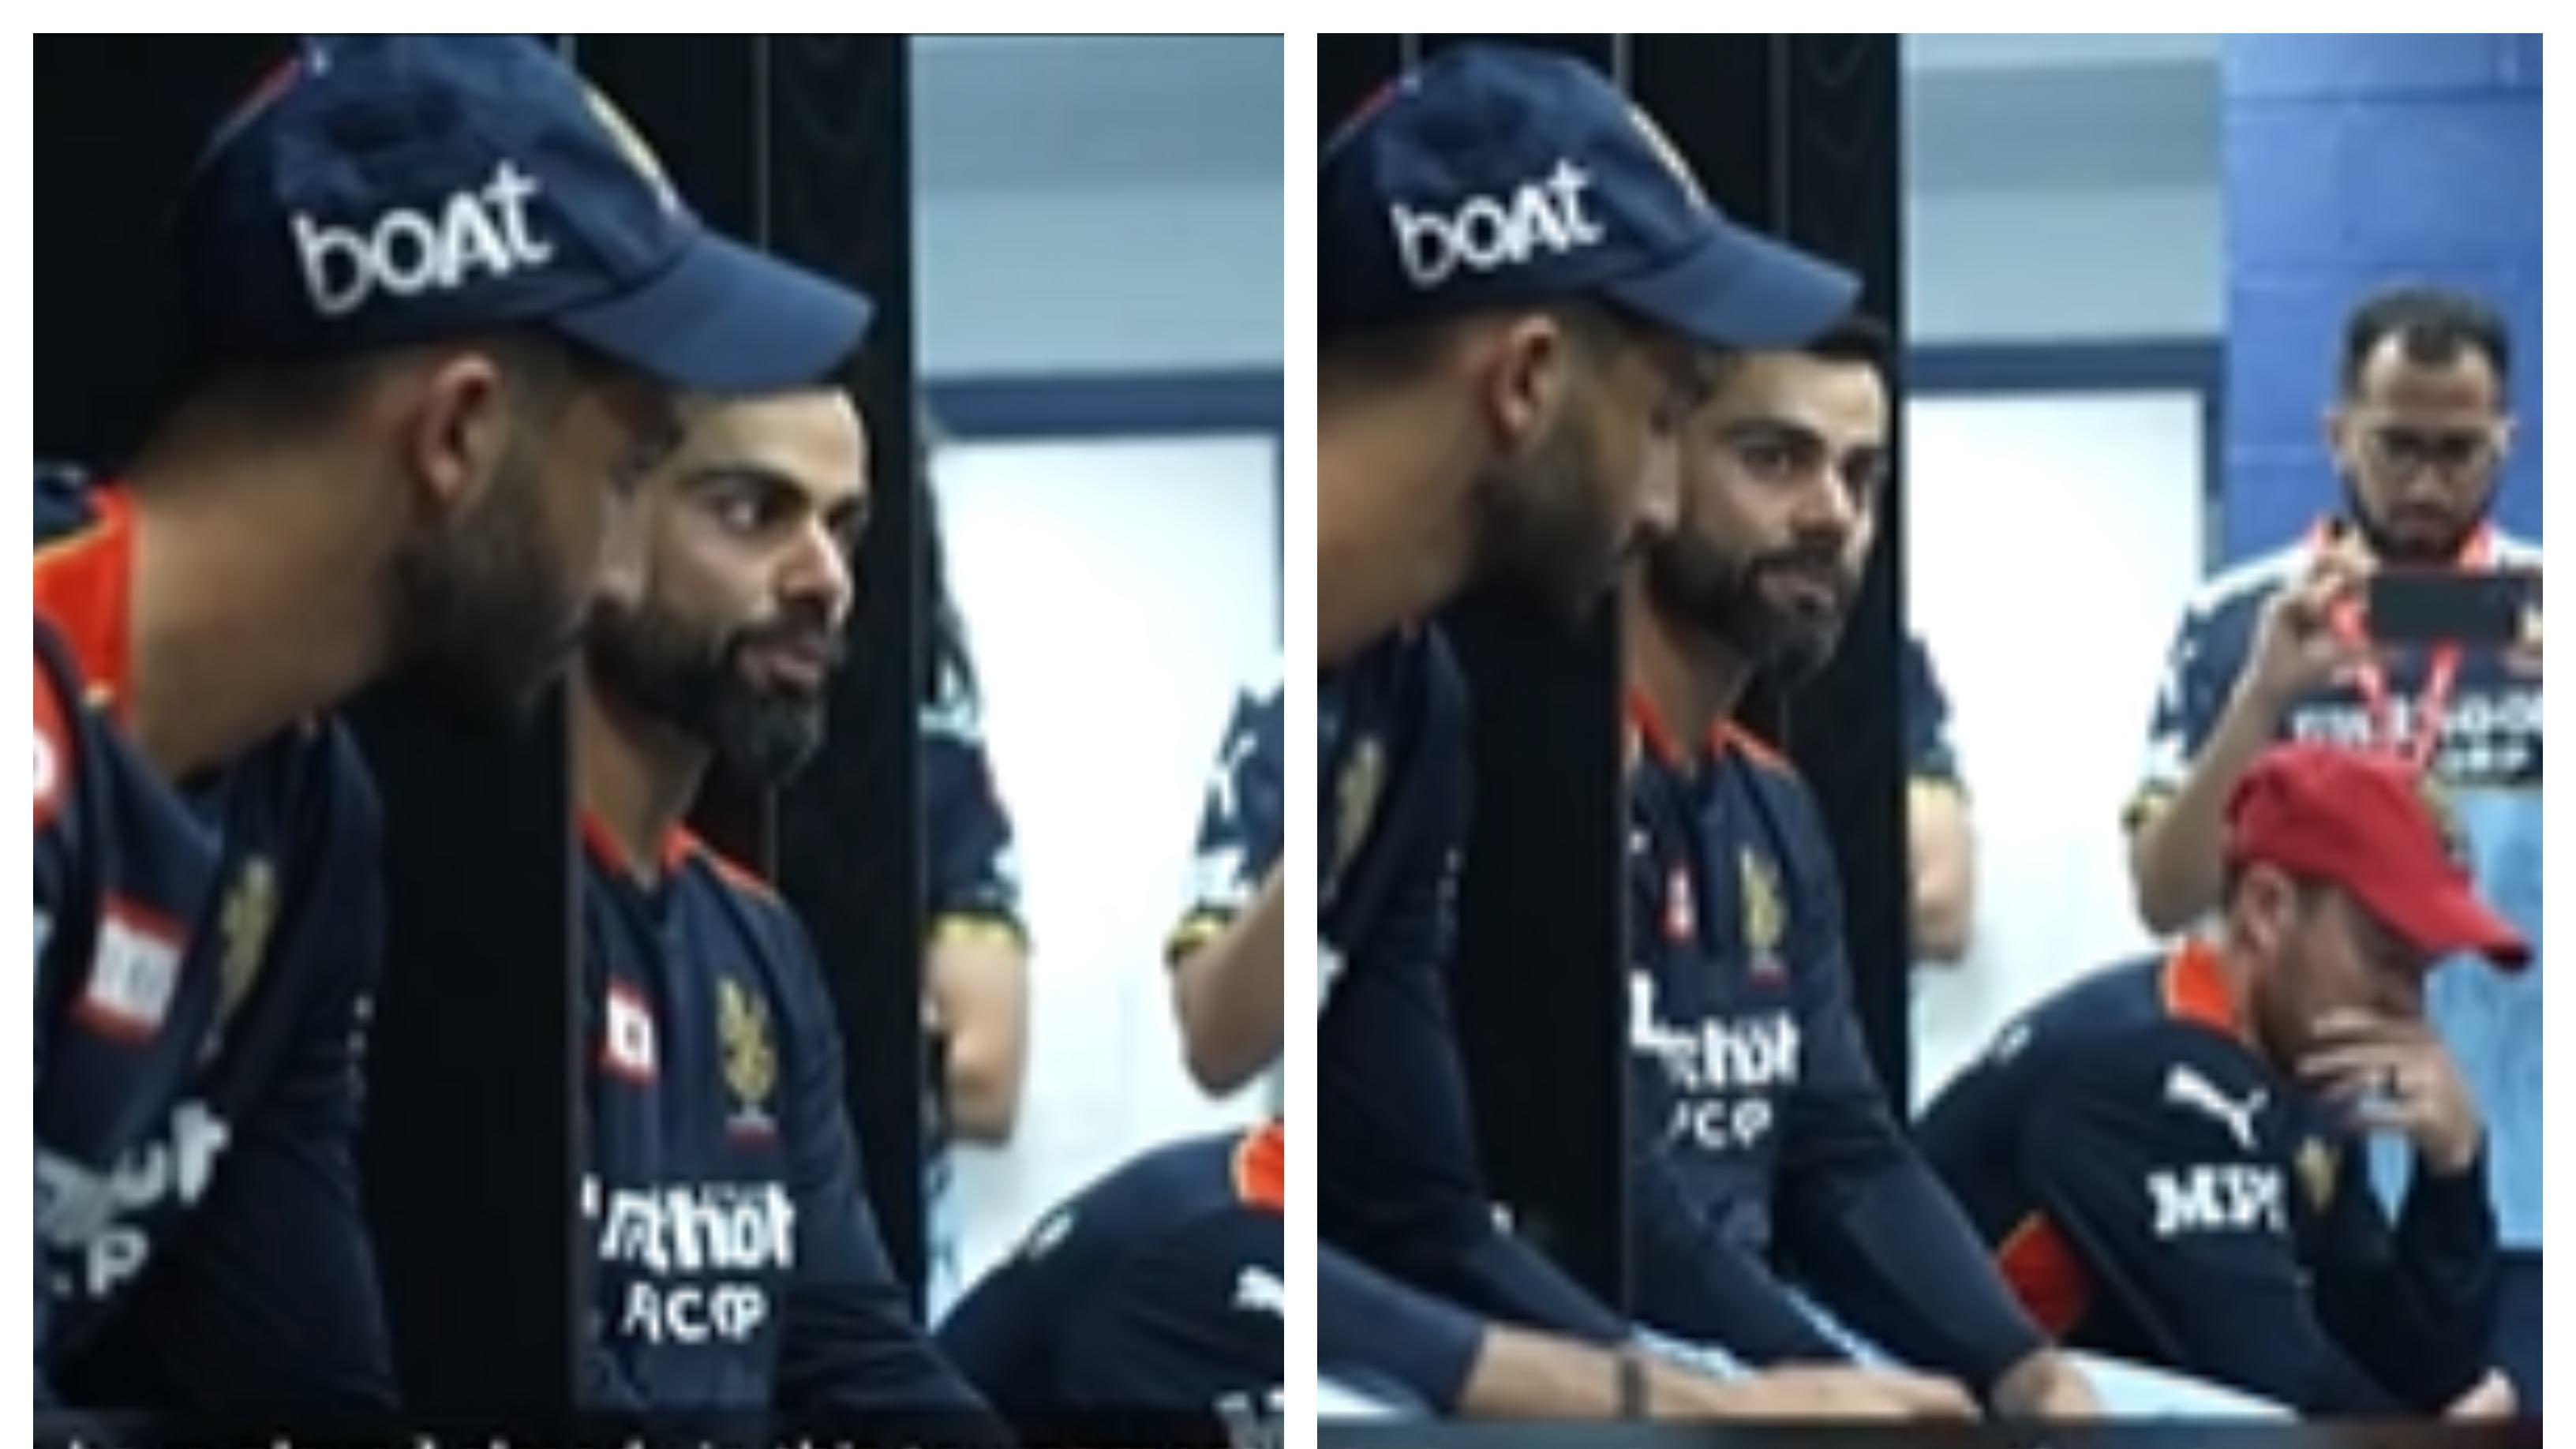 IPL 2021: WATCH - Virat Kohli's uplifting speech in the dressing room after RCB's crushing loss to KKR